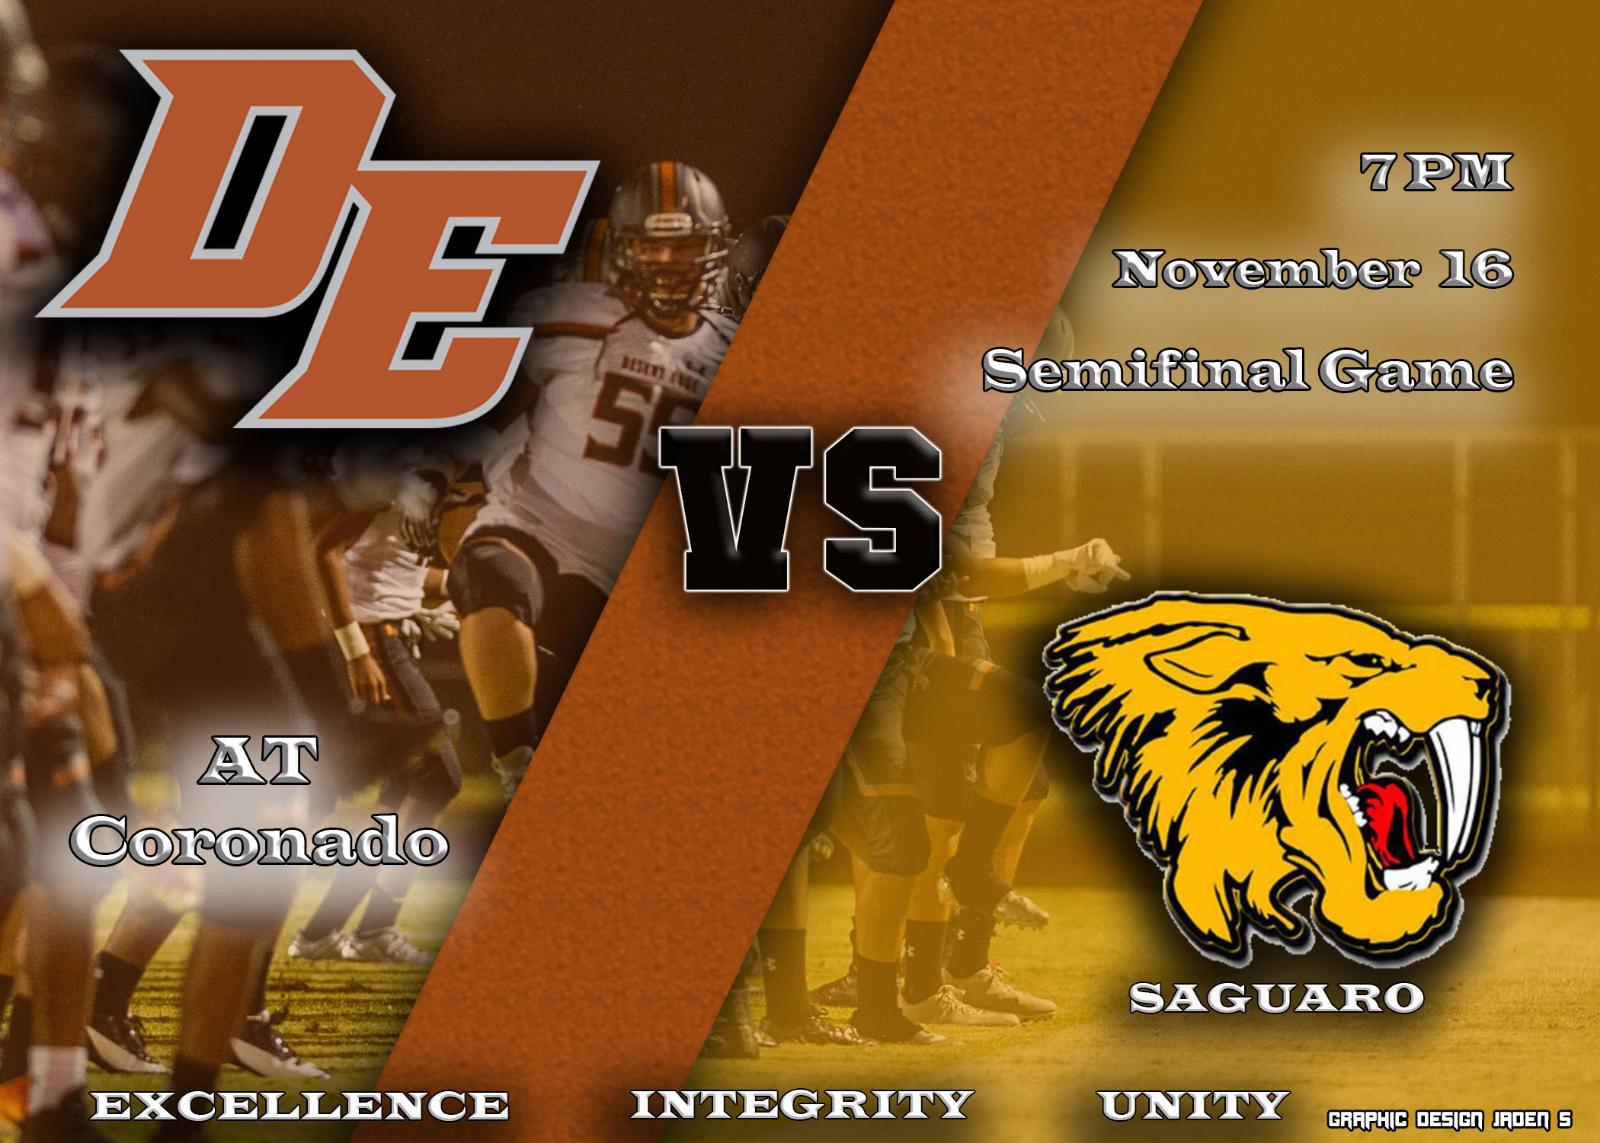 DE vs Saguaro Playoff Game Friday at 700pm!